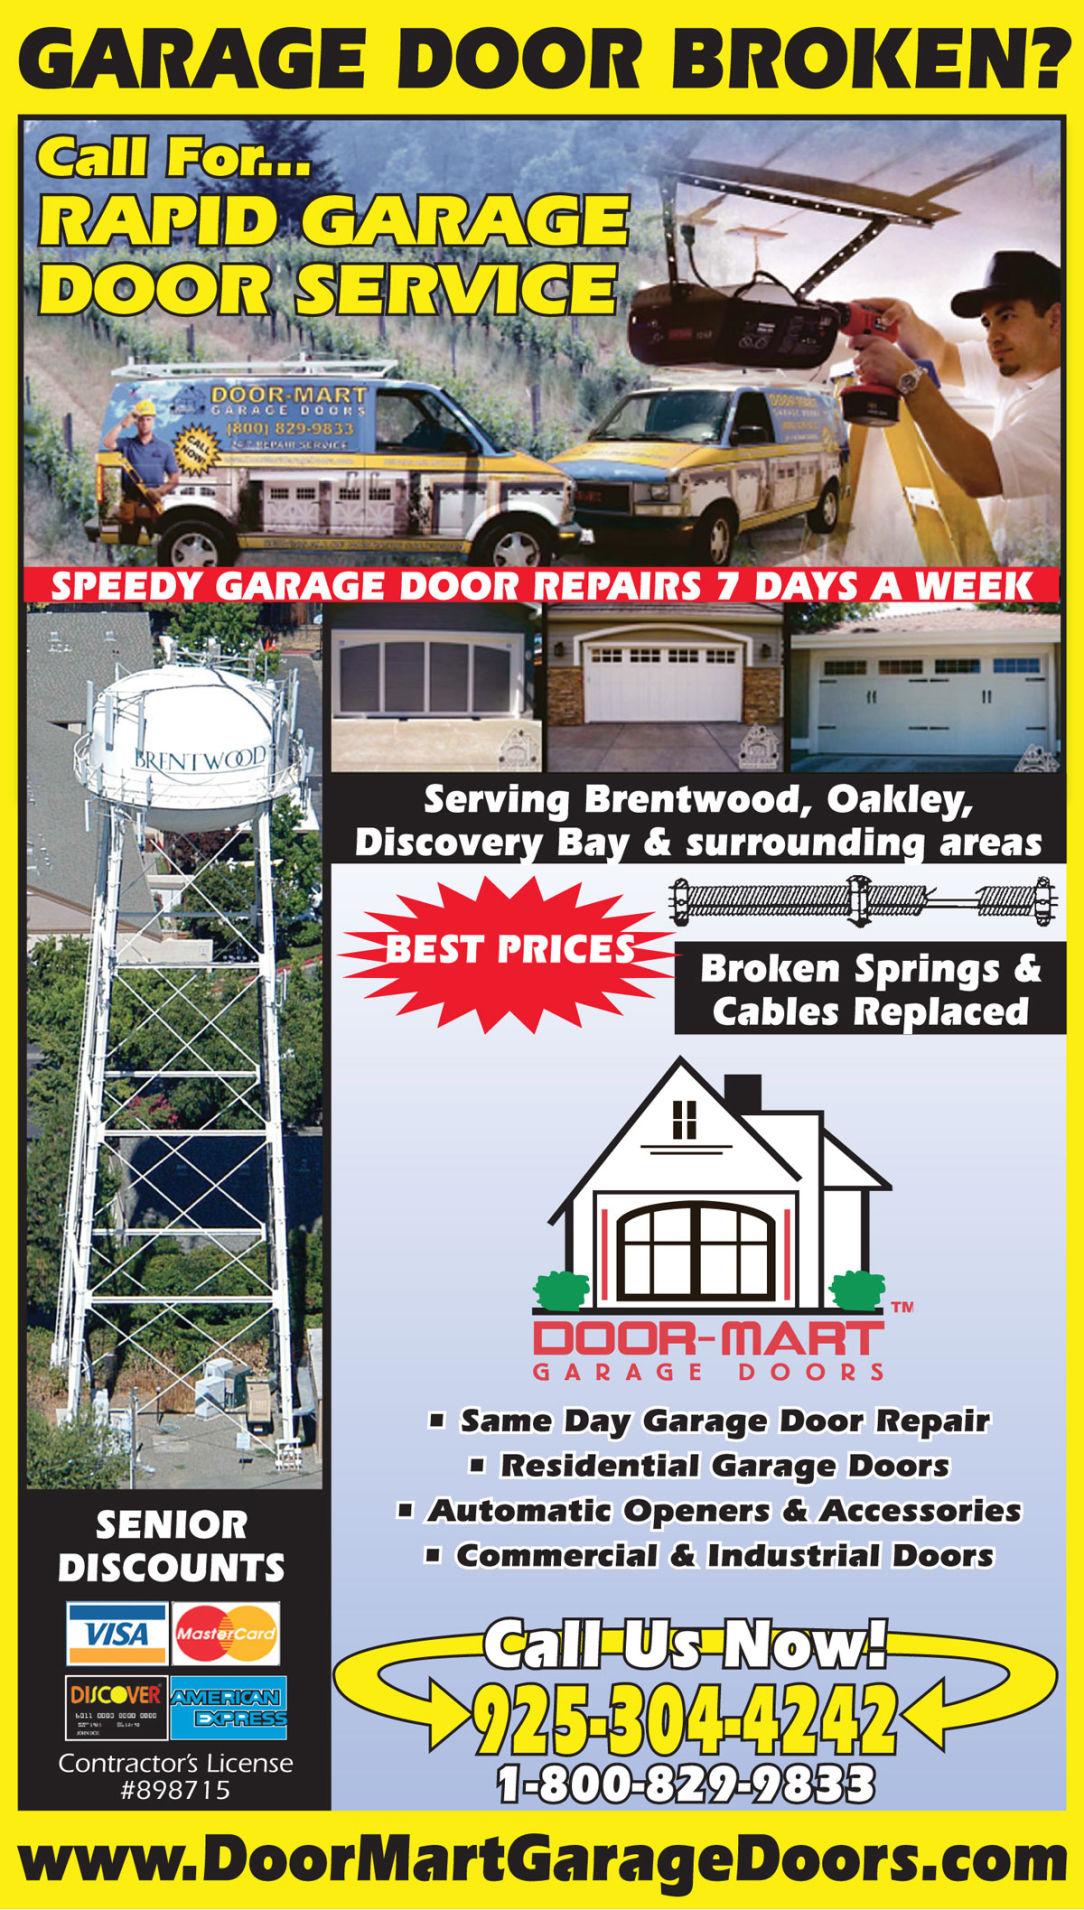 Door-Mart Garage Doors  sc 1 st  Brentwood Press & Door-Mart Garage Doors | doors | garage doors | Brentwood CA ... pezcame.com